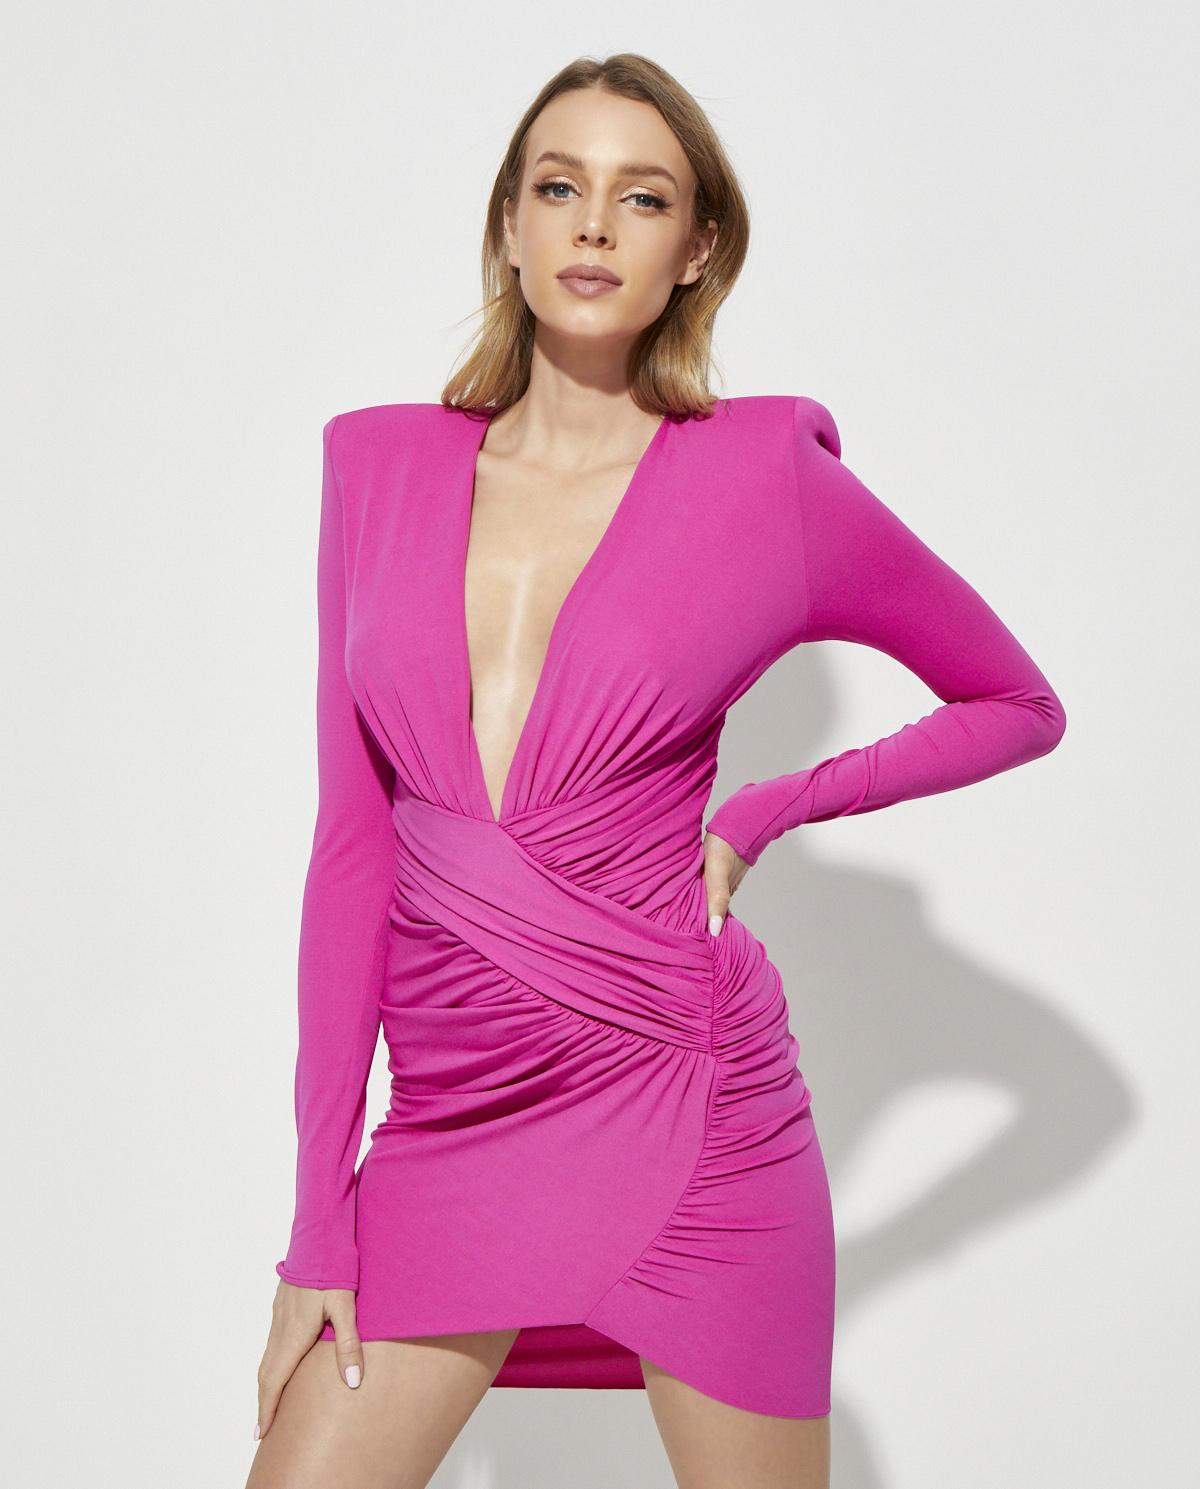 Różowa sukienka mini Alexandre Vauthier 202DR1280 1029-202 FUCHSIA